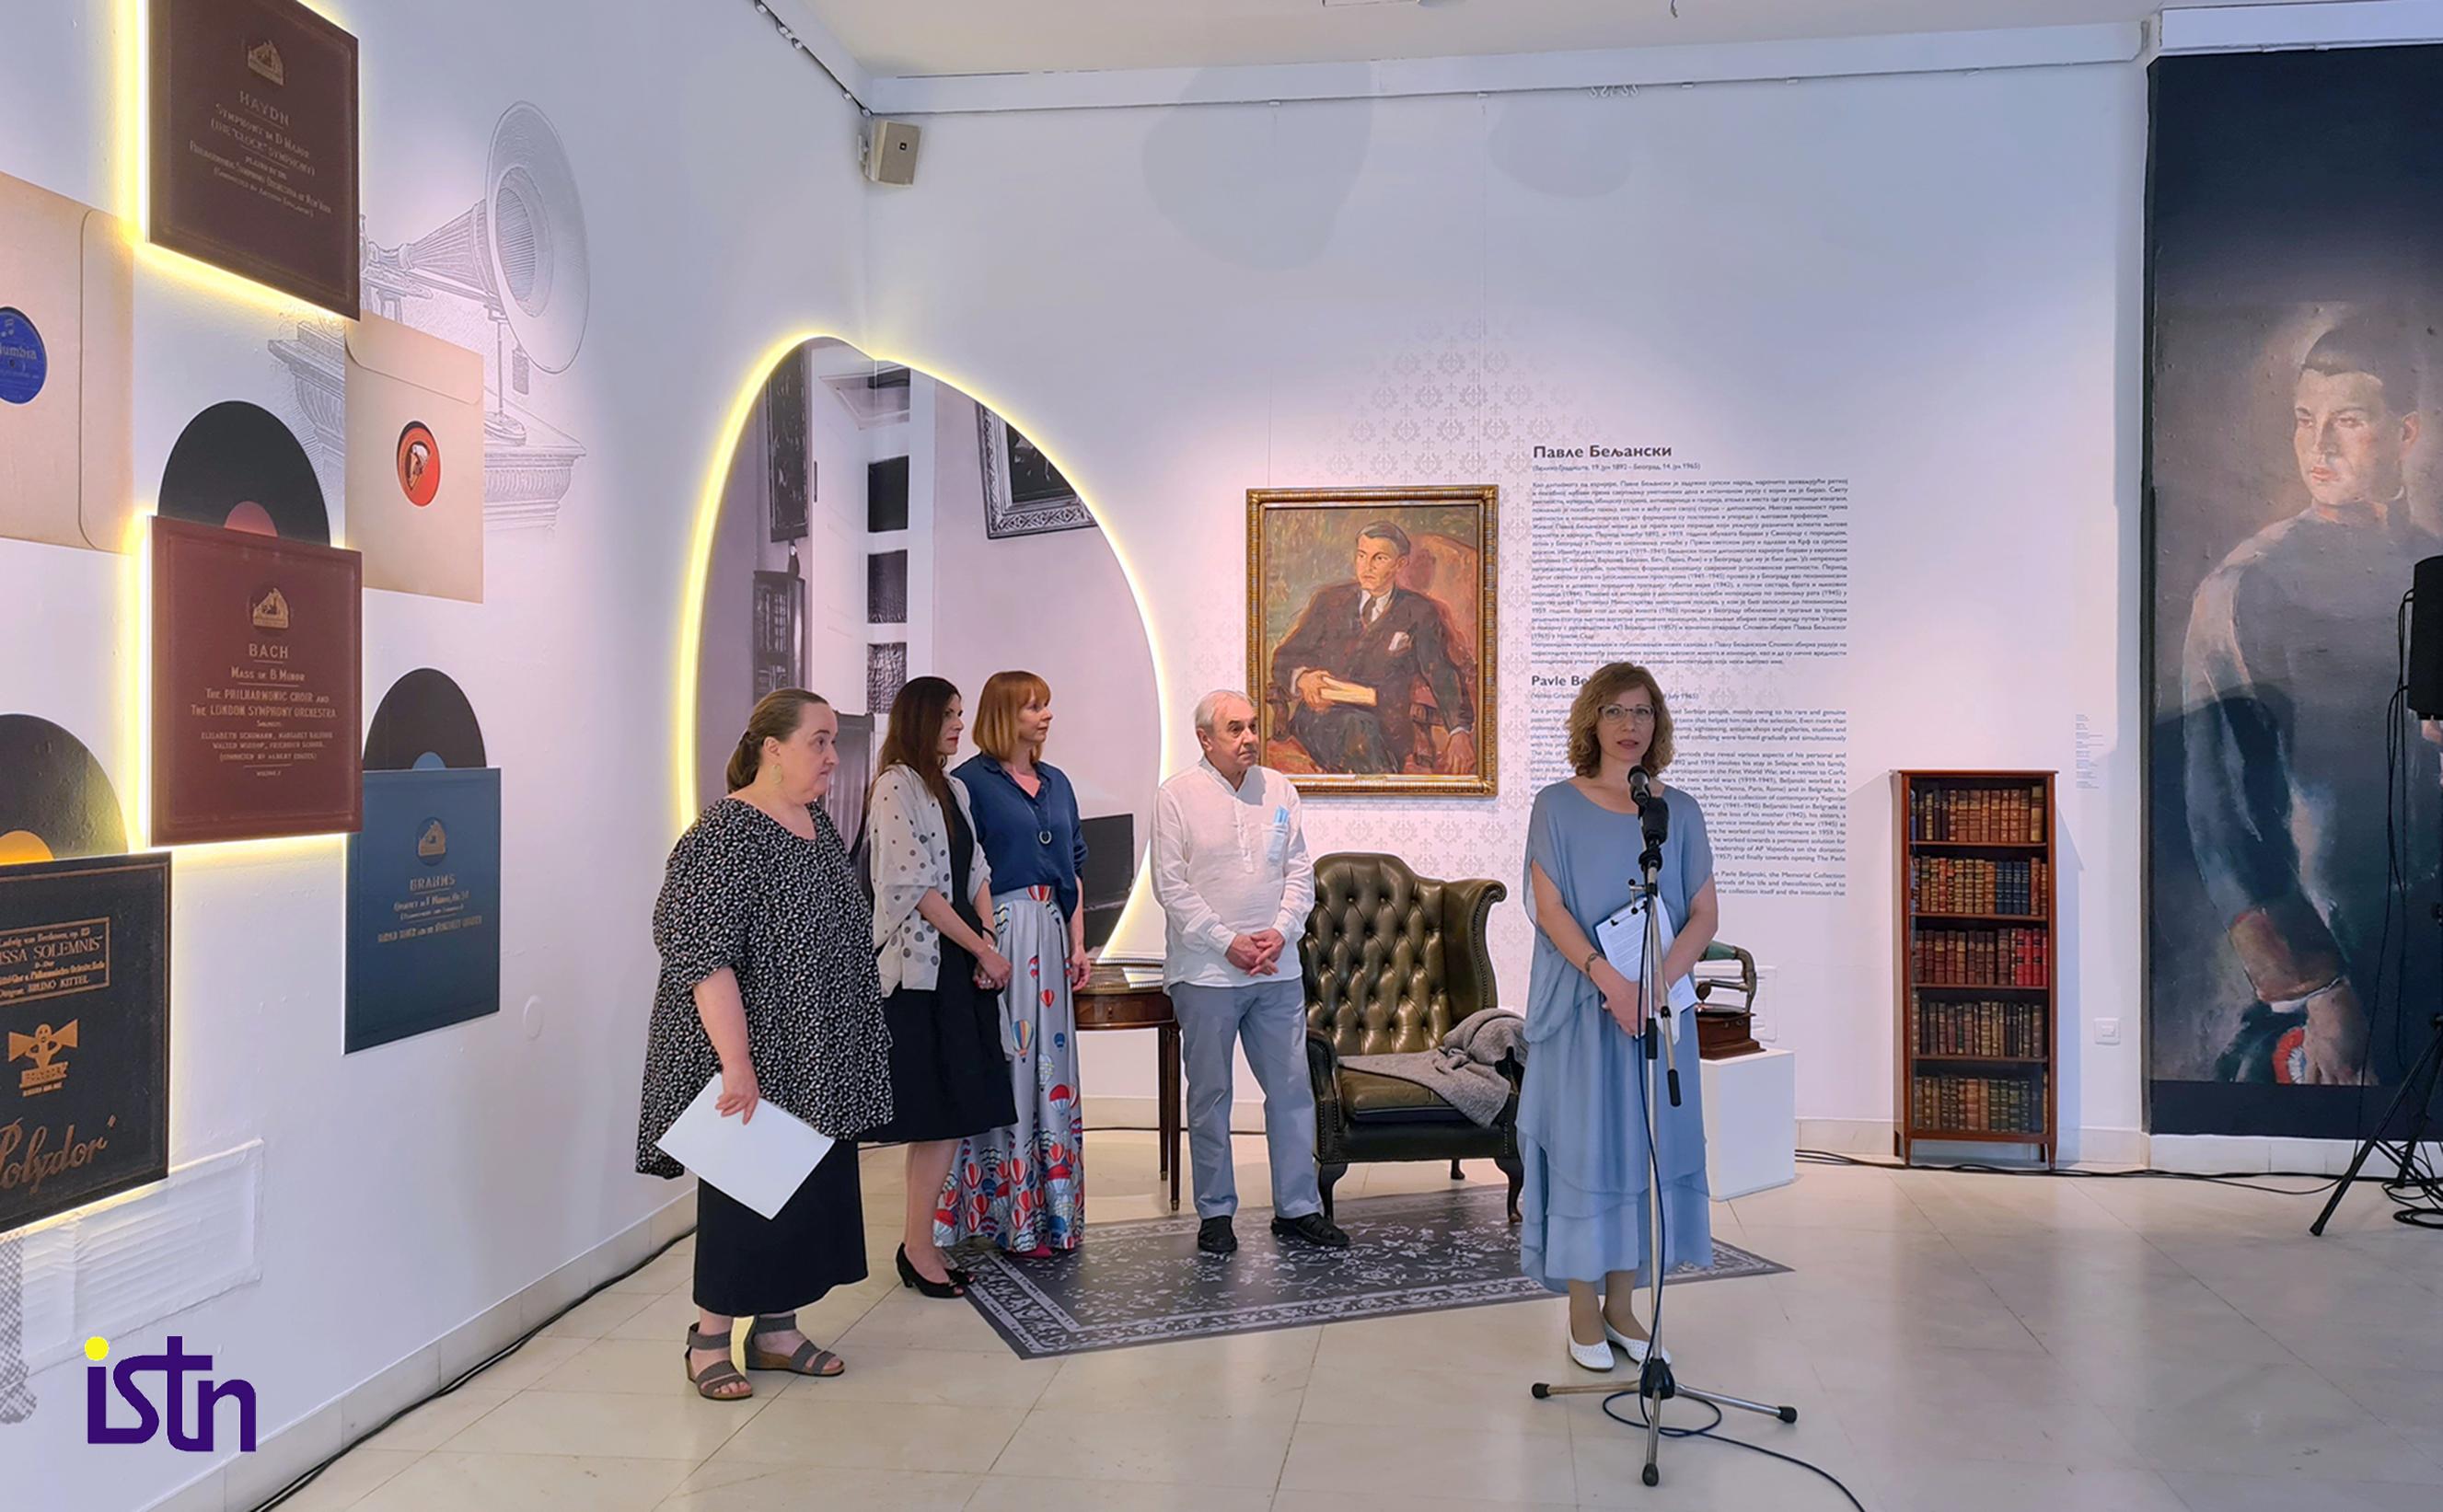 Izlozba Muzicki intermeco Spomen zbirke Pavla Beljanskoig, Milana Kvas, ISTN